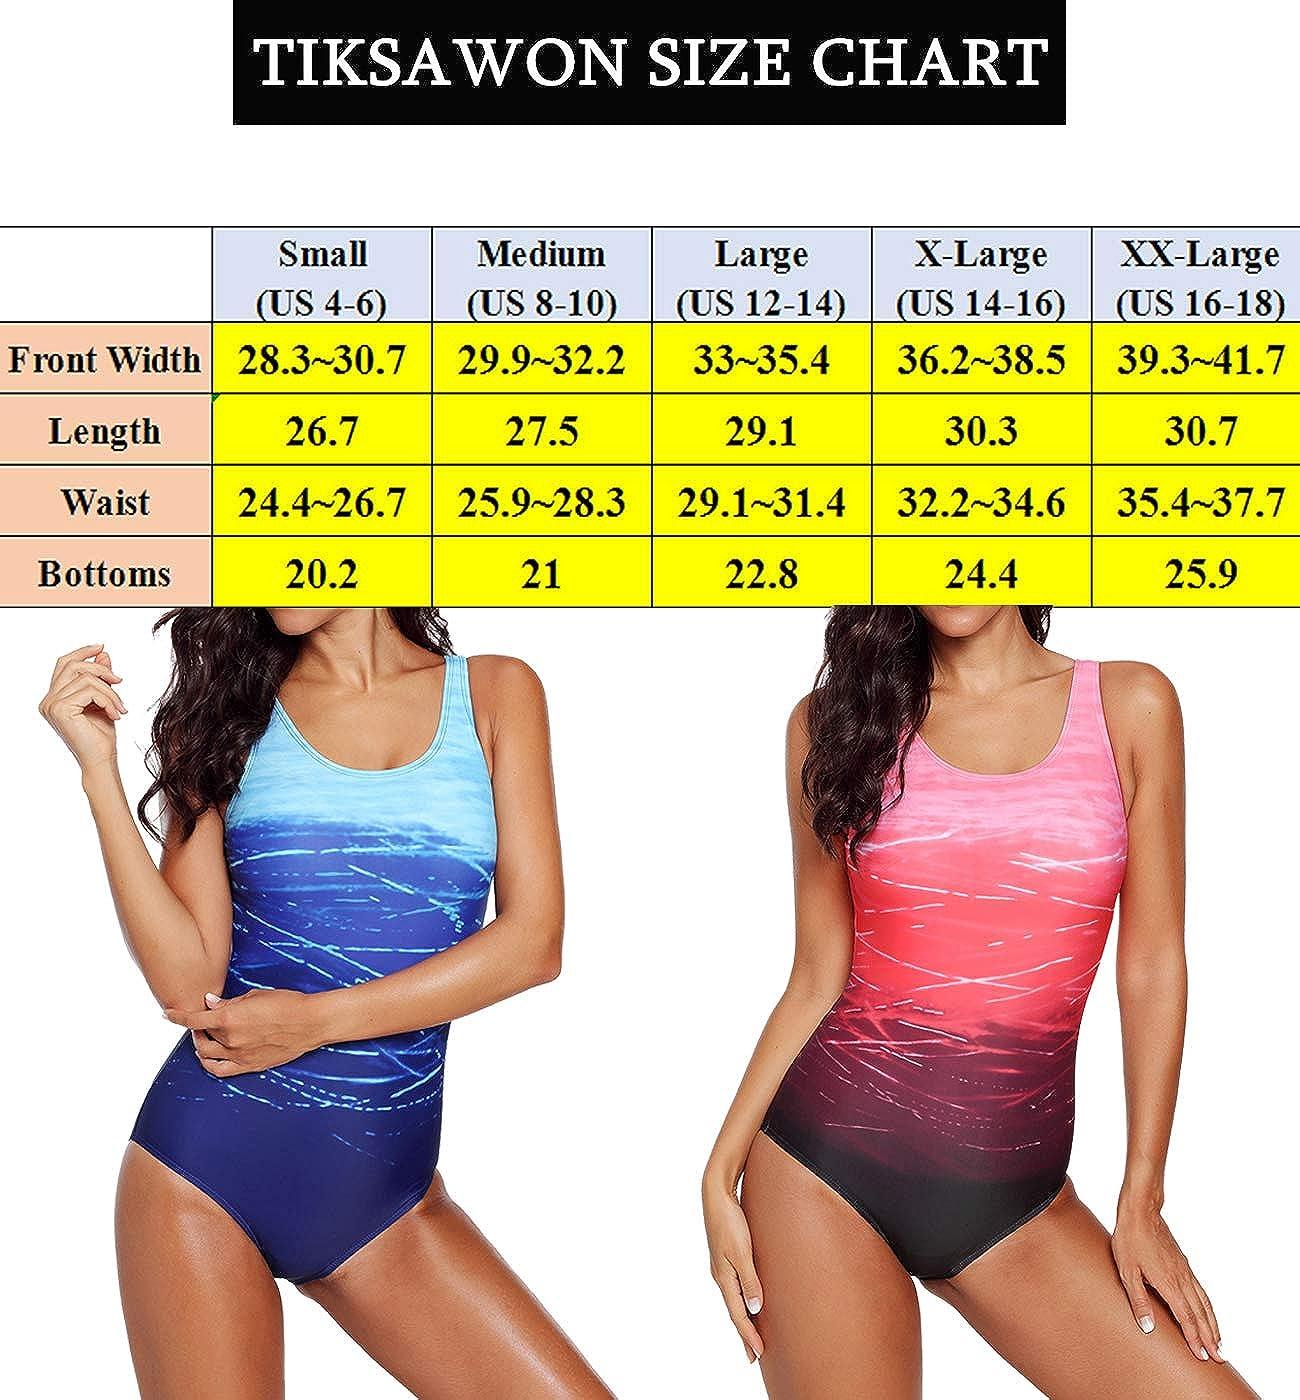 1189a73fff Tiksawon Retro Swimsuit Women's Printed Vintage Swimwear Tummy Control  Swimsuit Push Up One Piece Bathing Suit at Amazon Women's Clothing store: